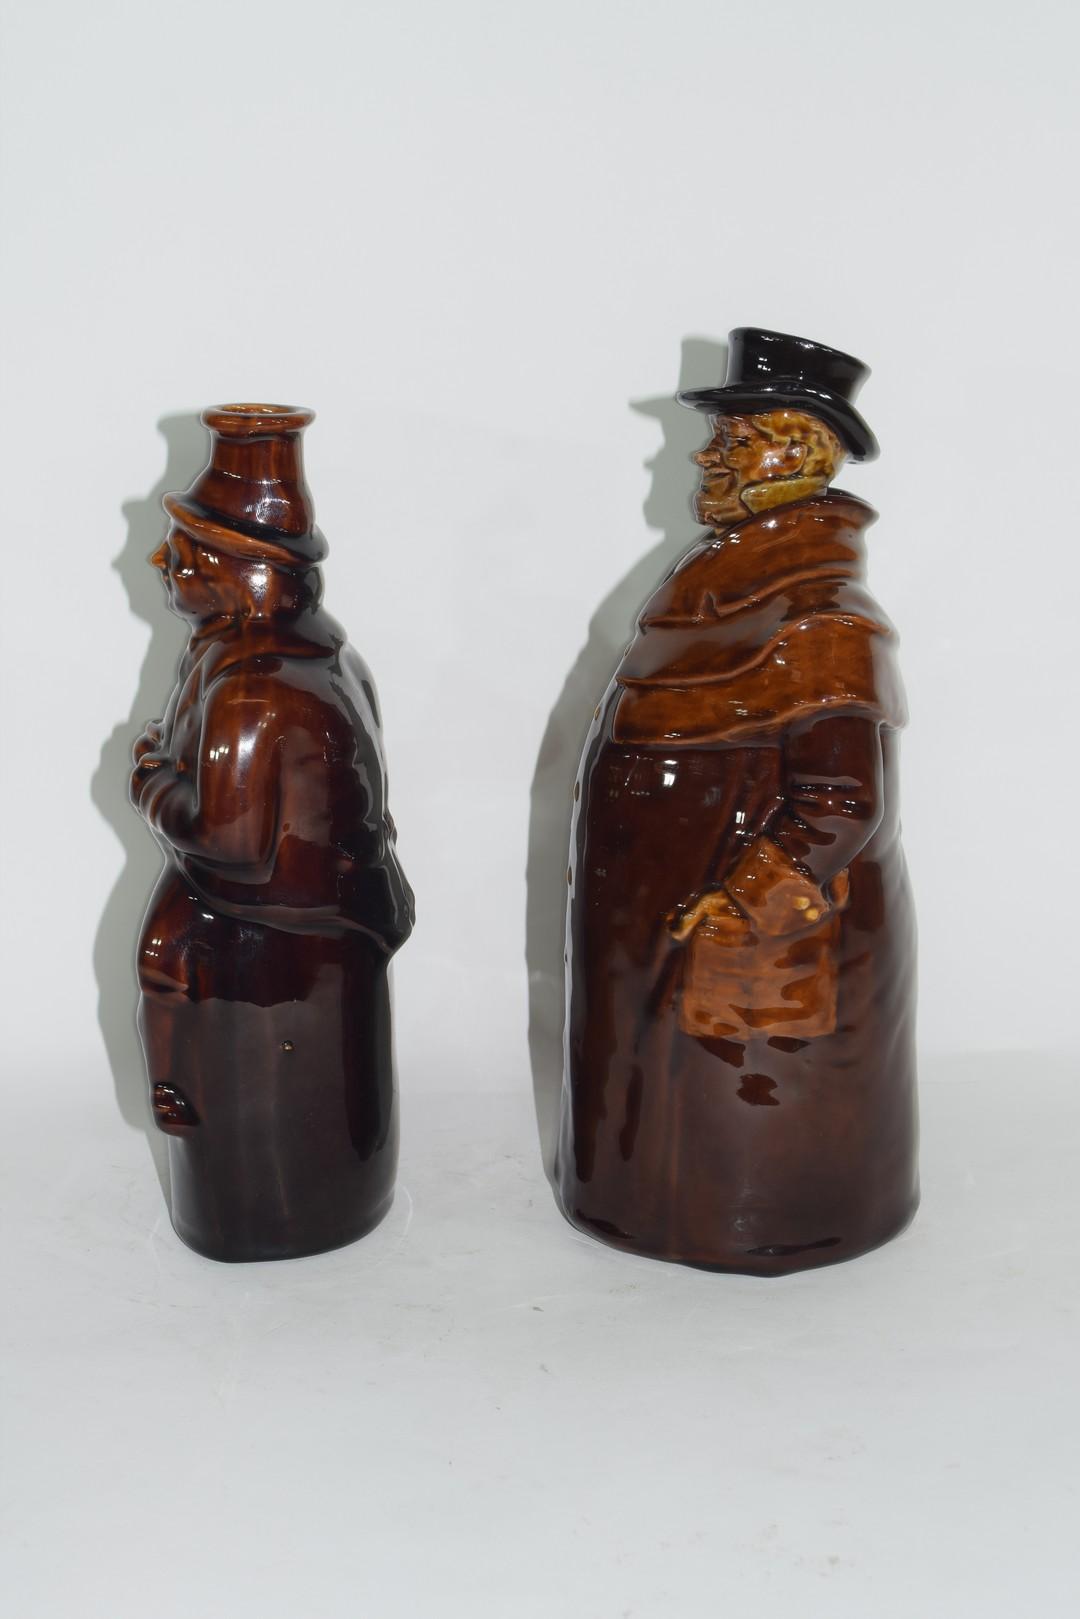 Royal Doulton Kingsware flask - Image 4 of 5